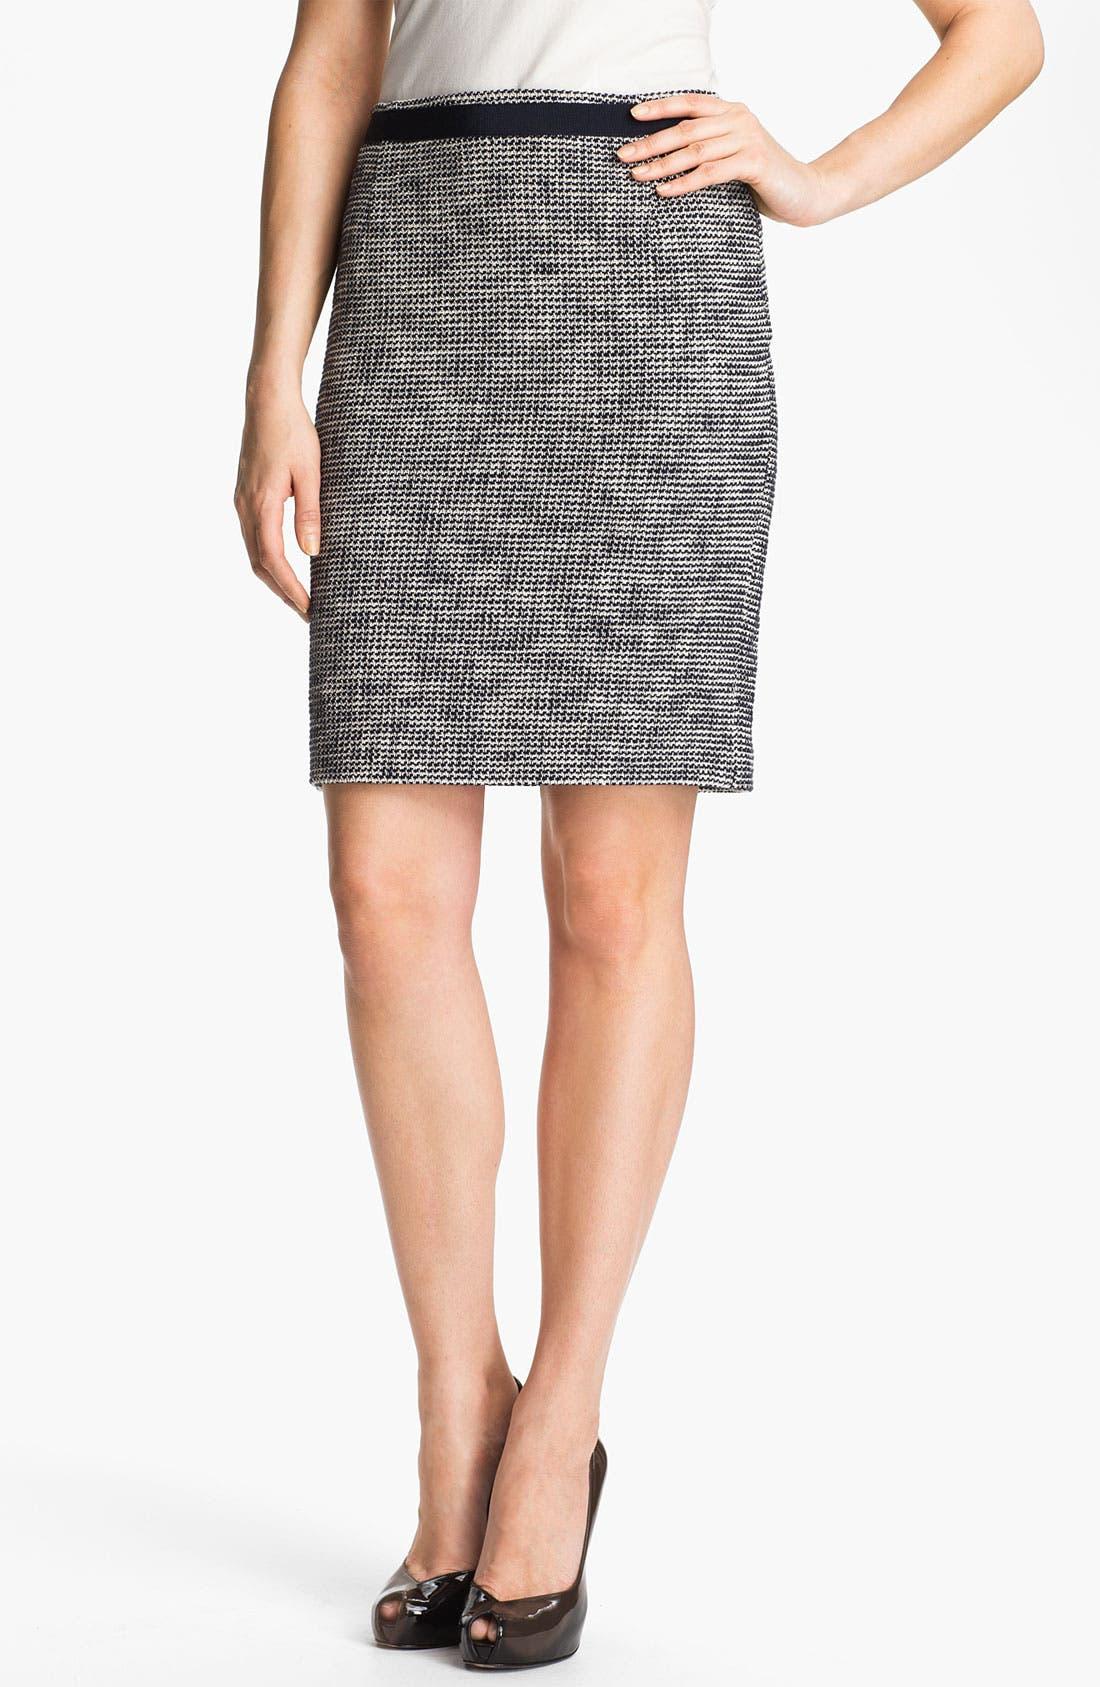 Alternate Image 1 Selected - Weekend Max Mara 'Fiorina' Skirt